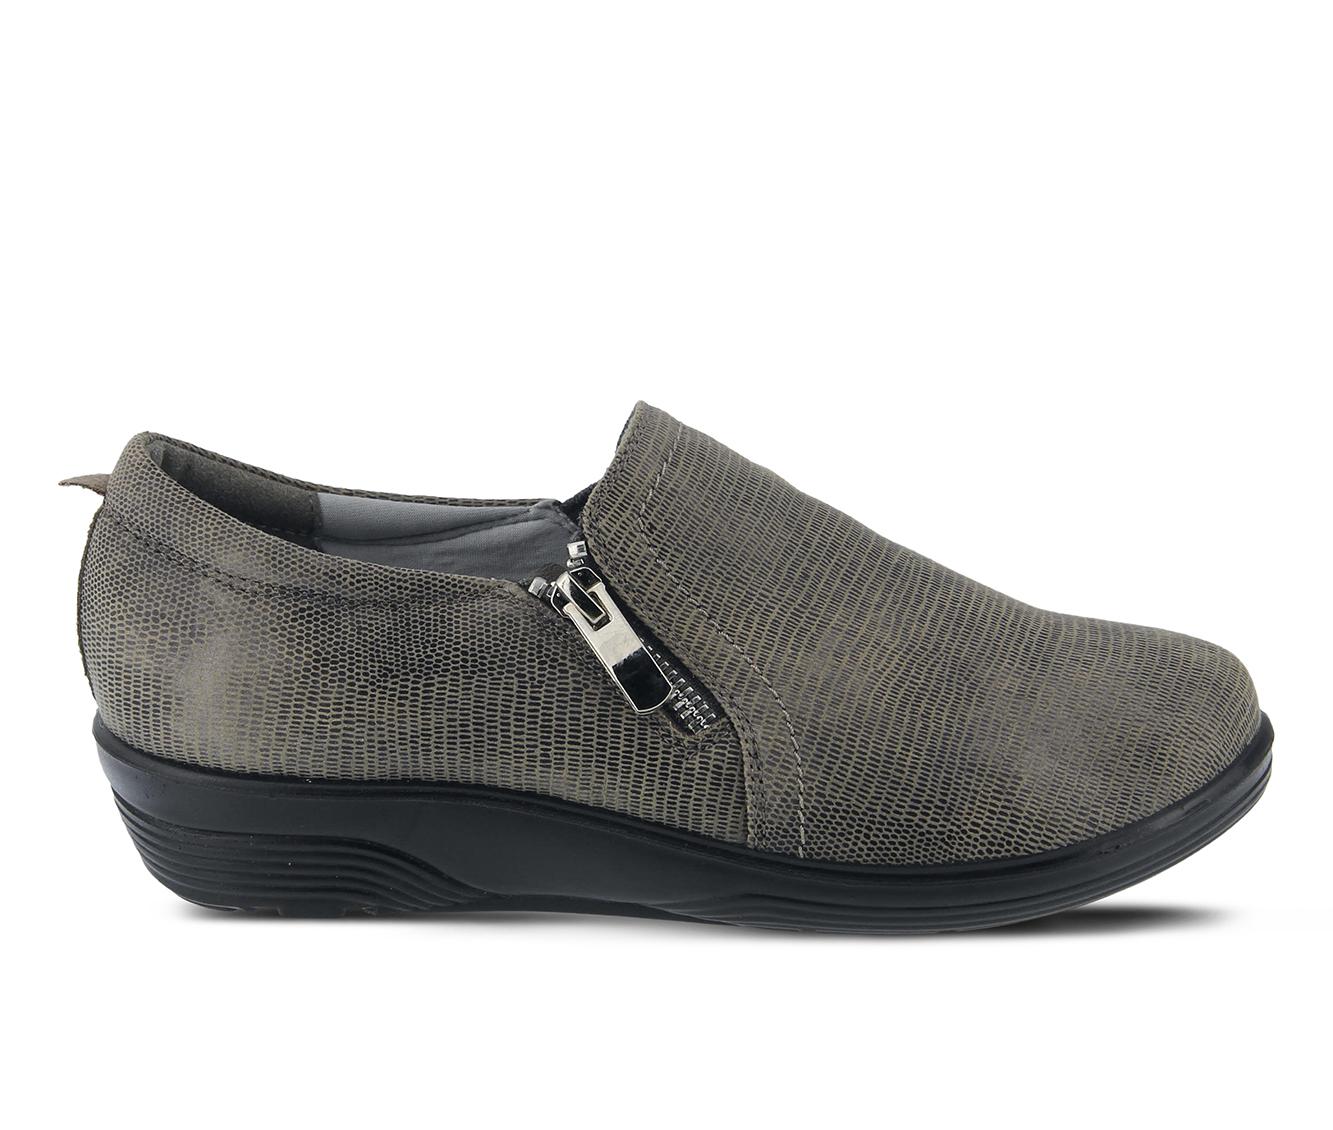 Flexus Mandiella Women's Shoe (Gray Faux Leather)